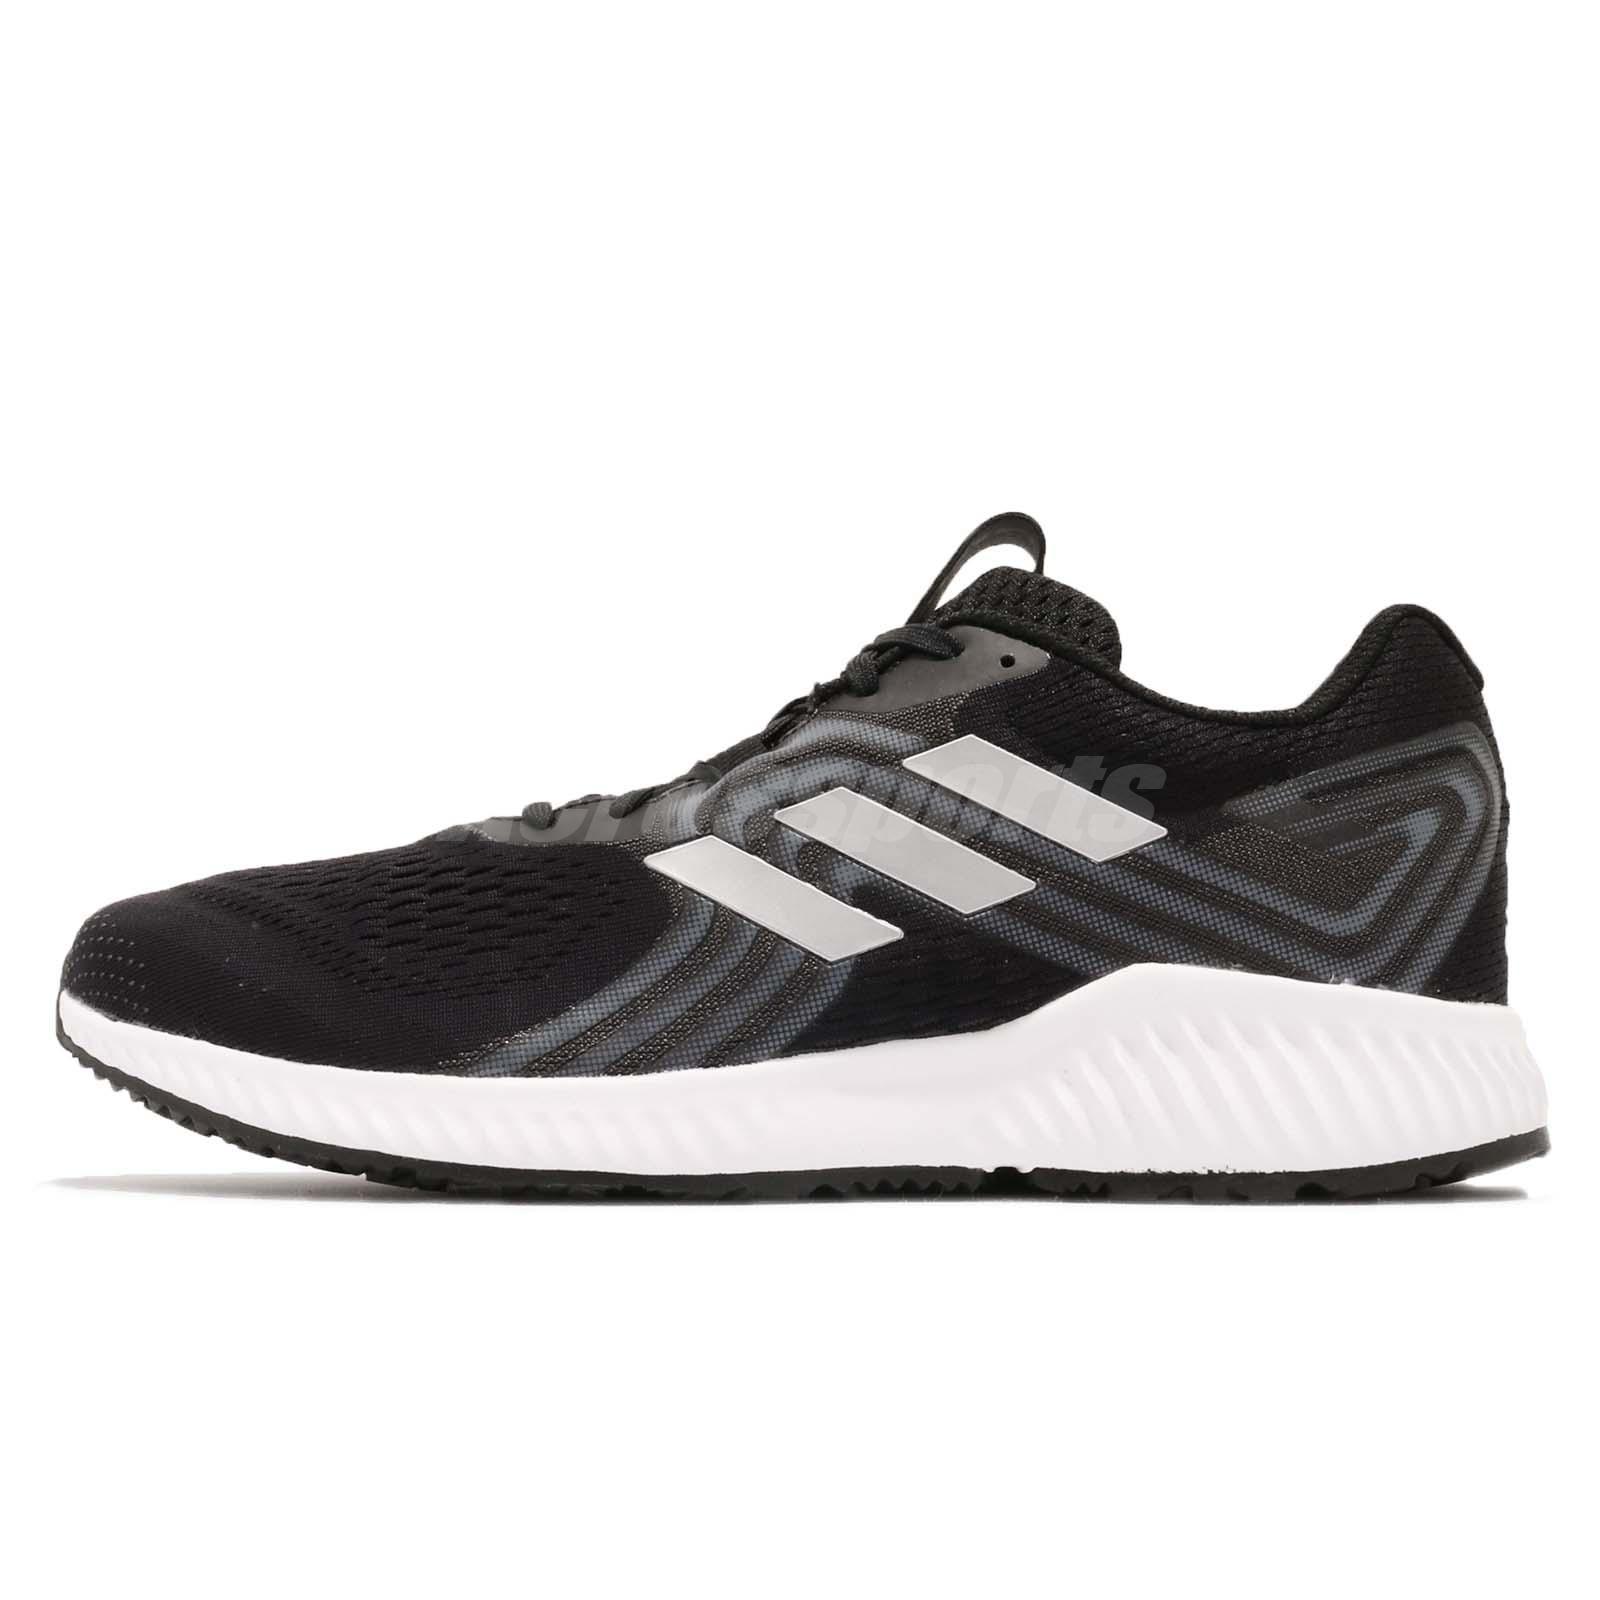 adidas Aerobounce 2 M Black Silver Aqua White Men Running Shoes Sneakers  AQ0536 bc92a19e1